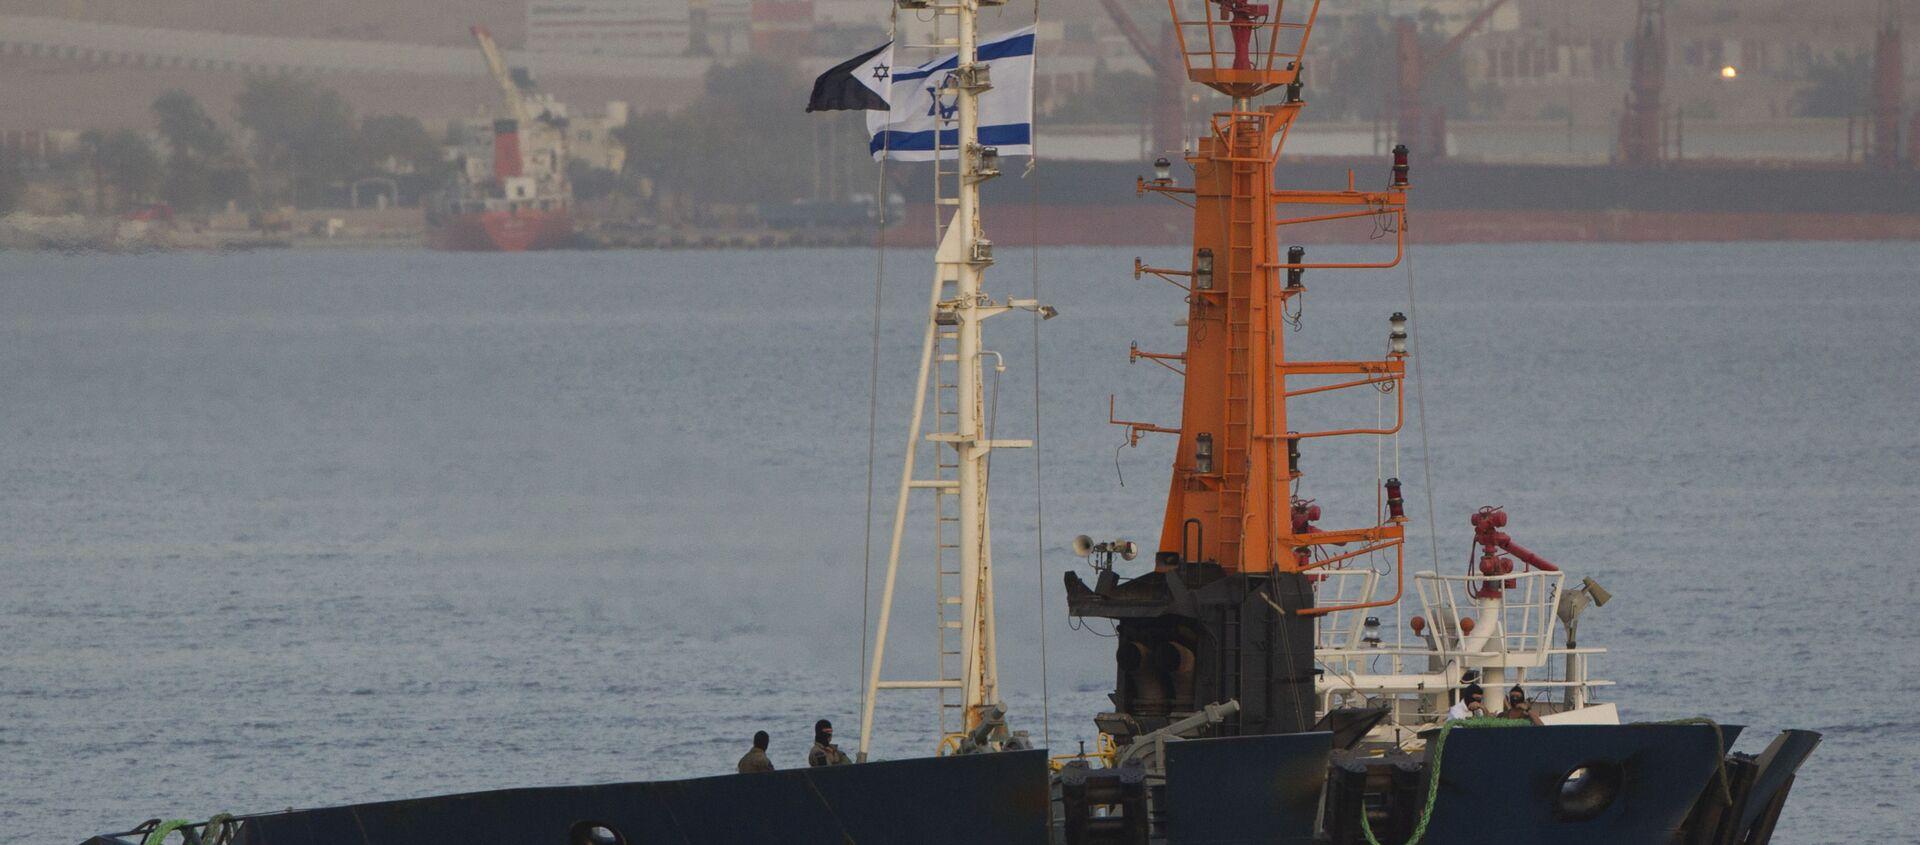 Commando israeliani su nave nel Mar Rosso - Sputnik Italia, 1920, 07.04.2021